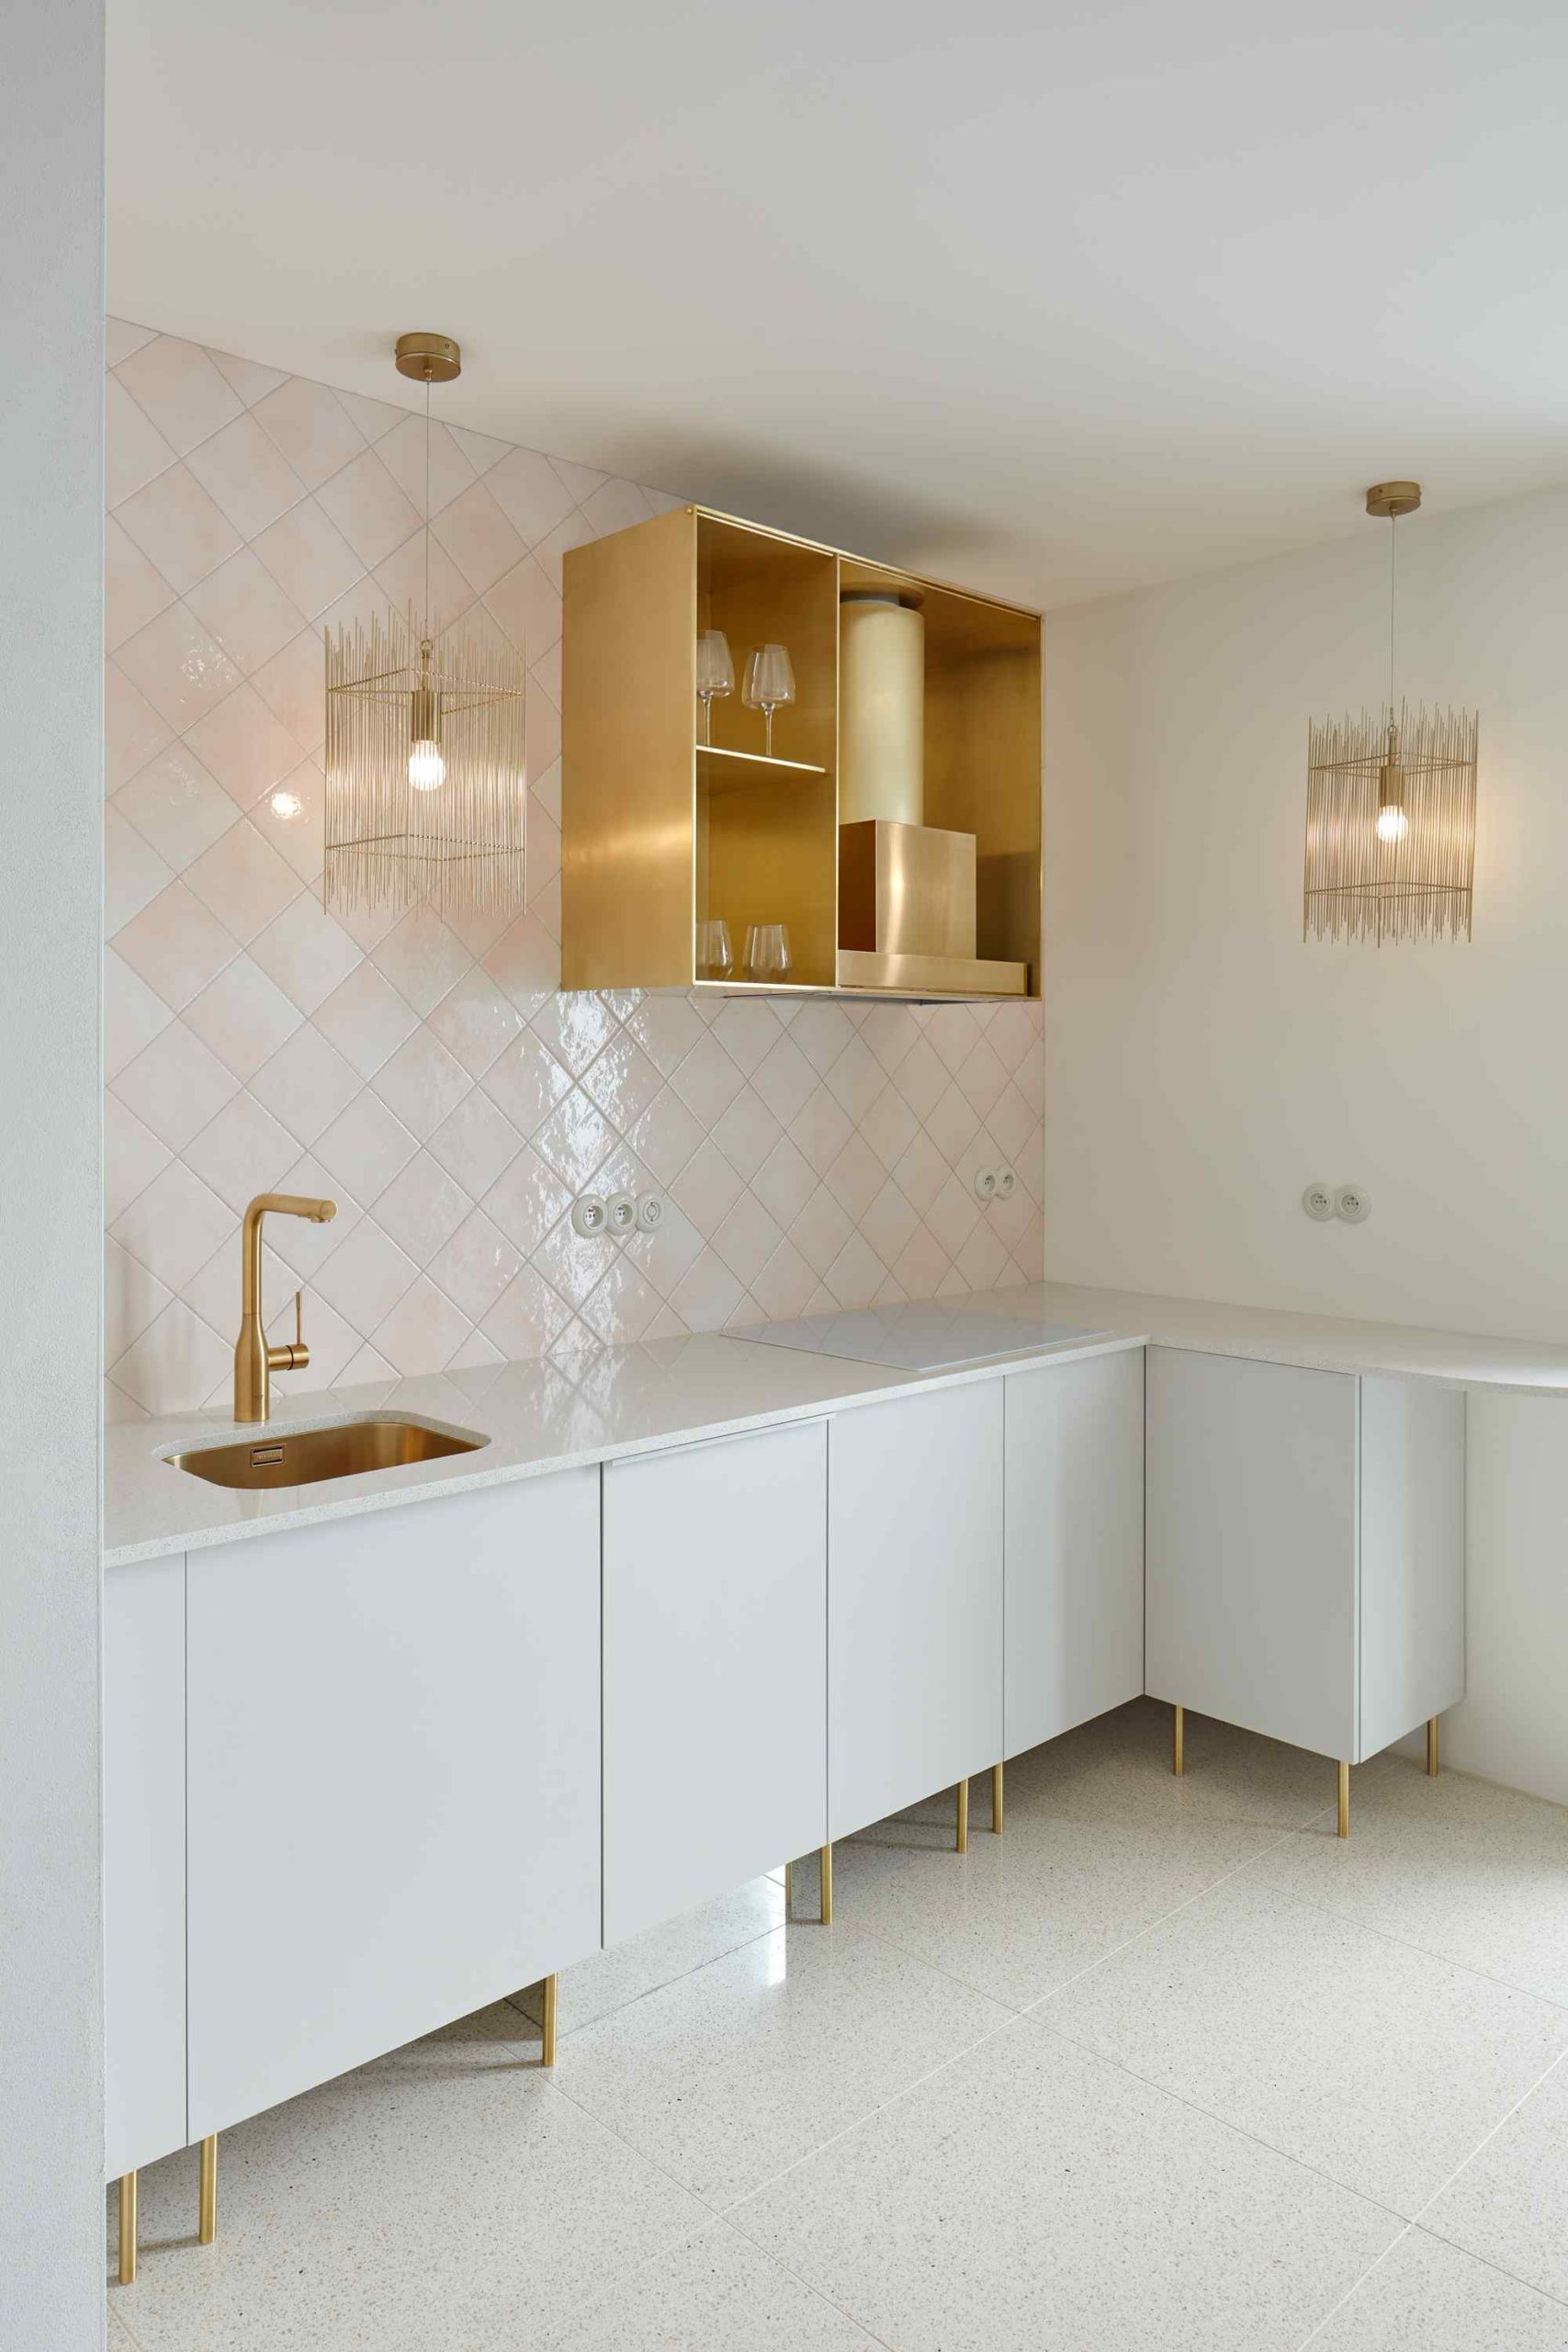 Kuchyň s mosadznými detaily